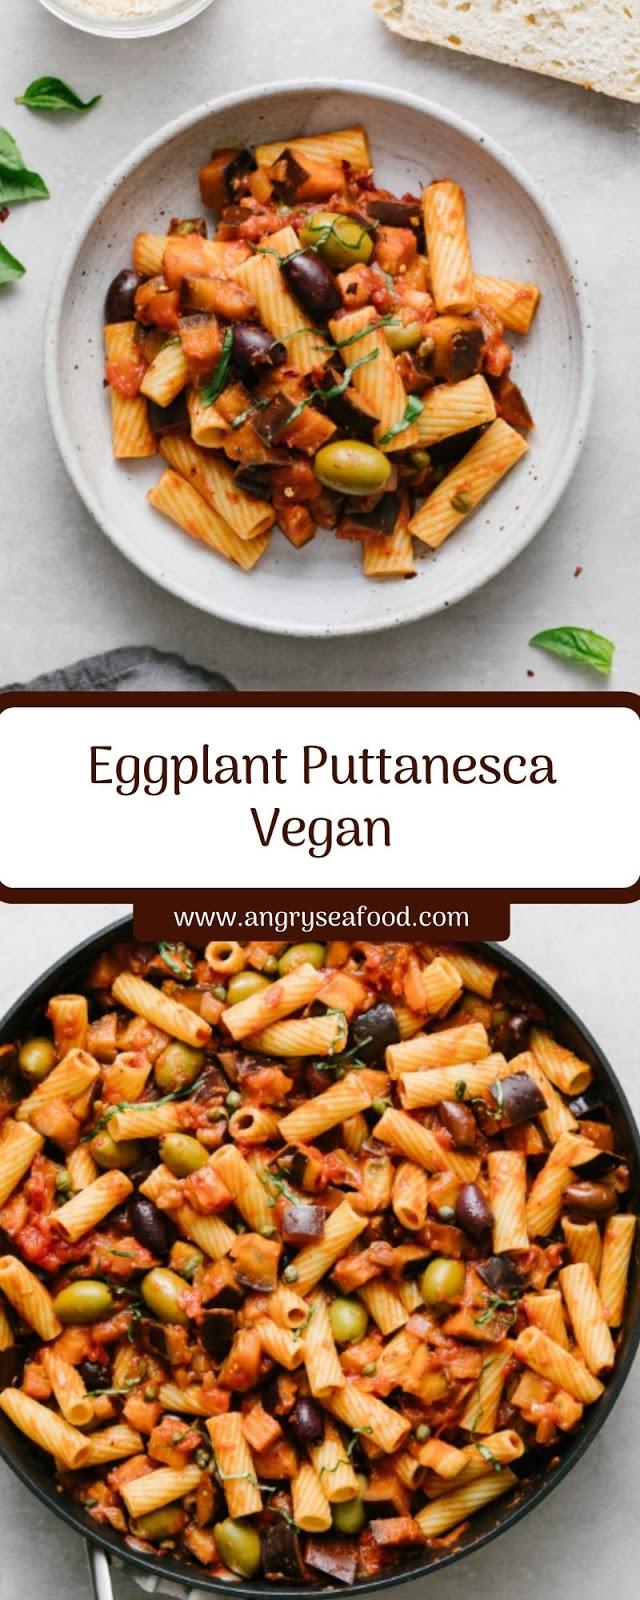 Eggplant Puttanesca Vegan